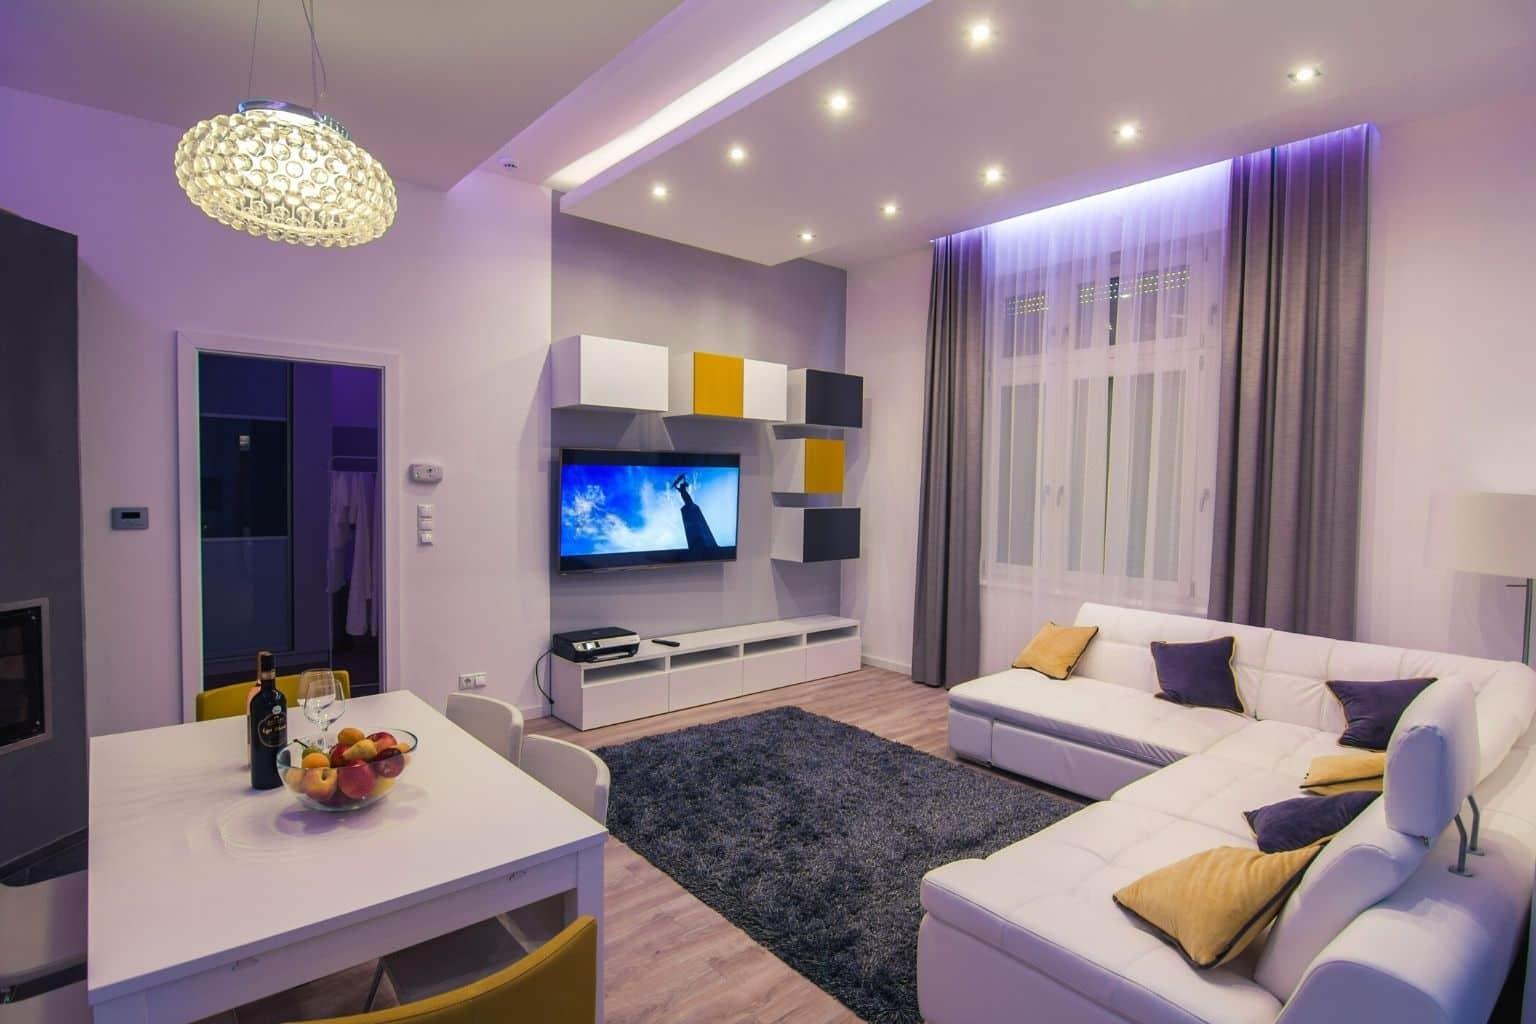 Feels just like home, huge TV, comfy sofa, mood lighting